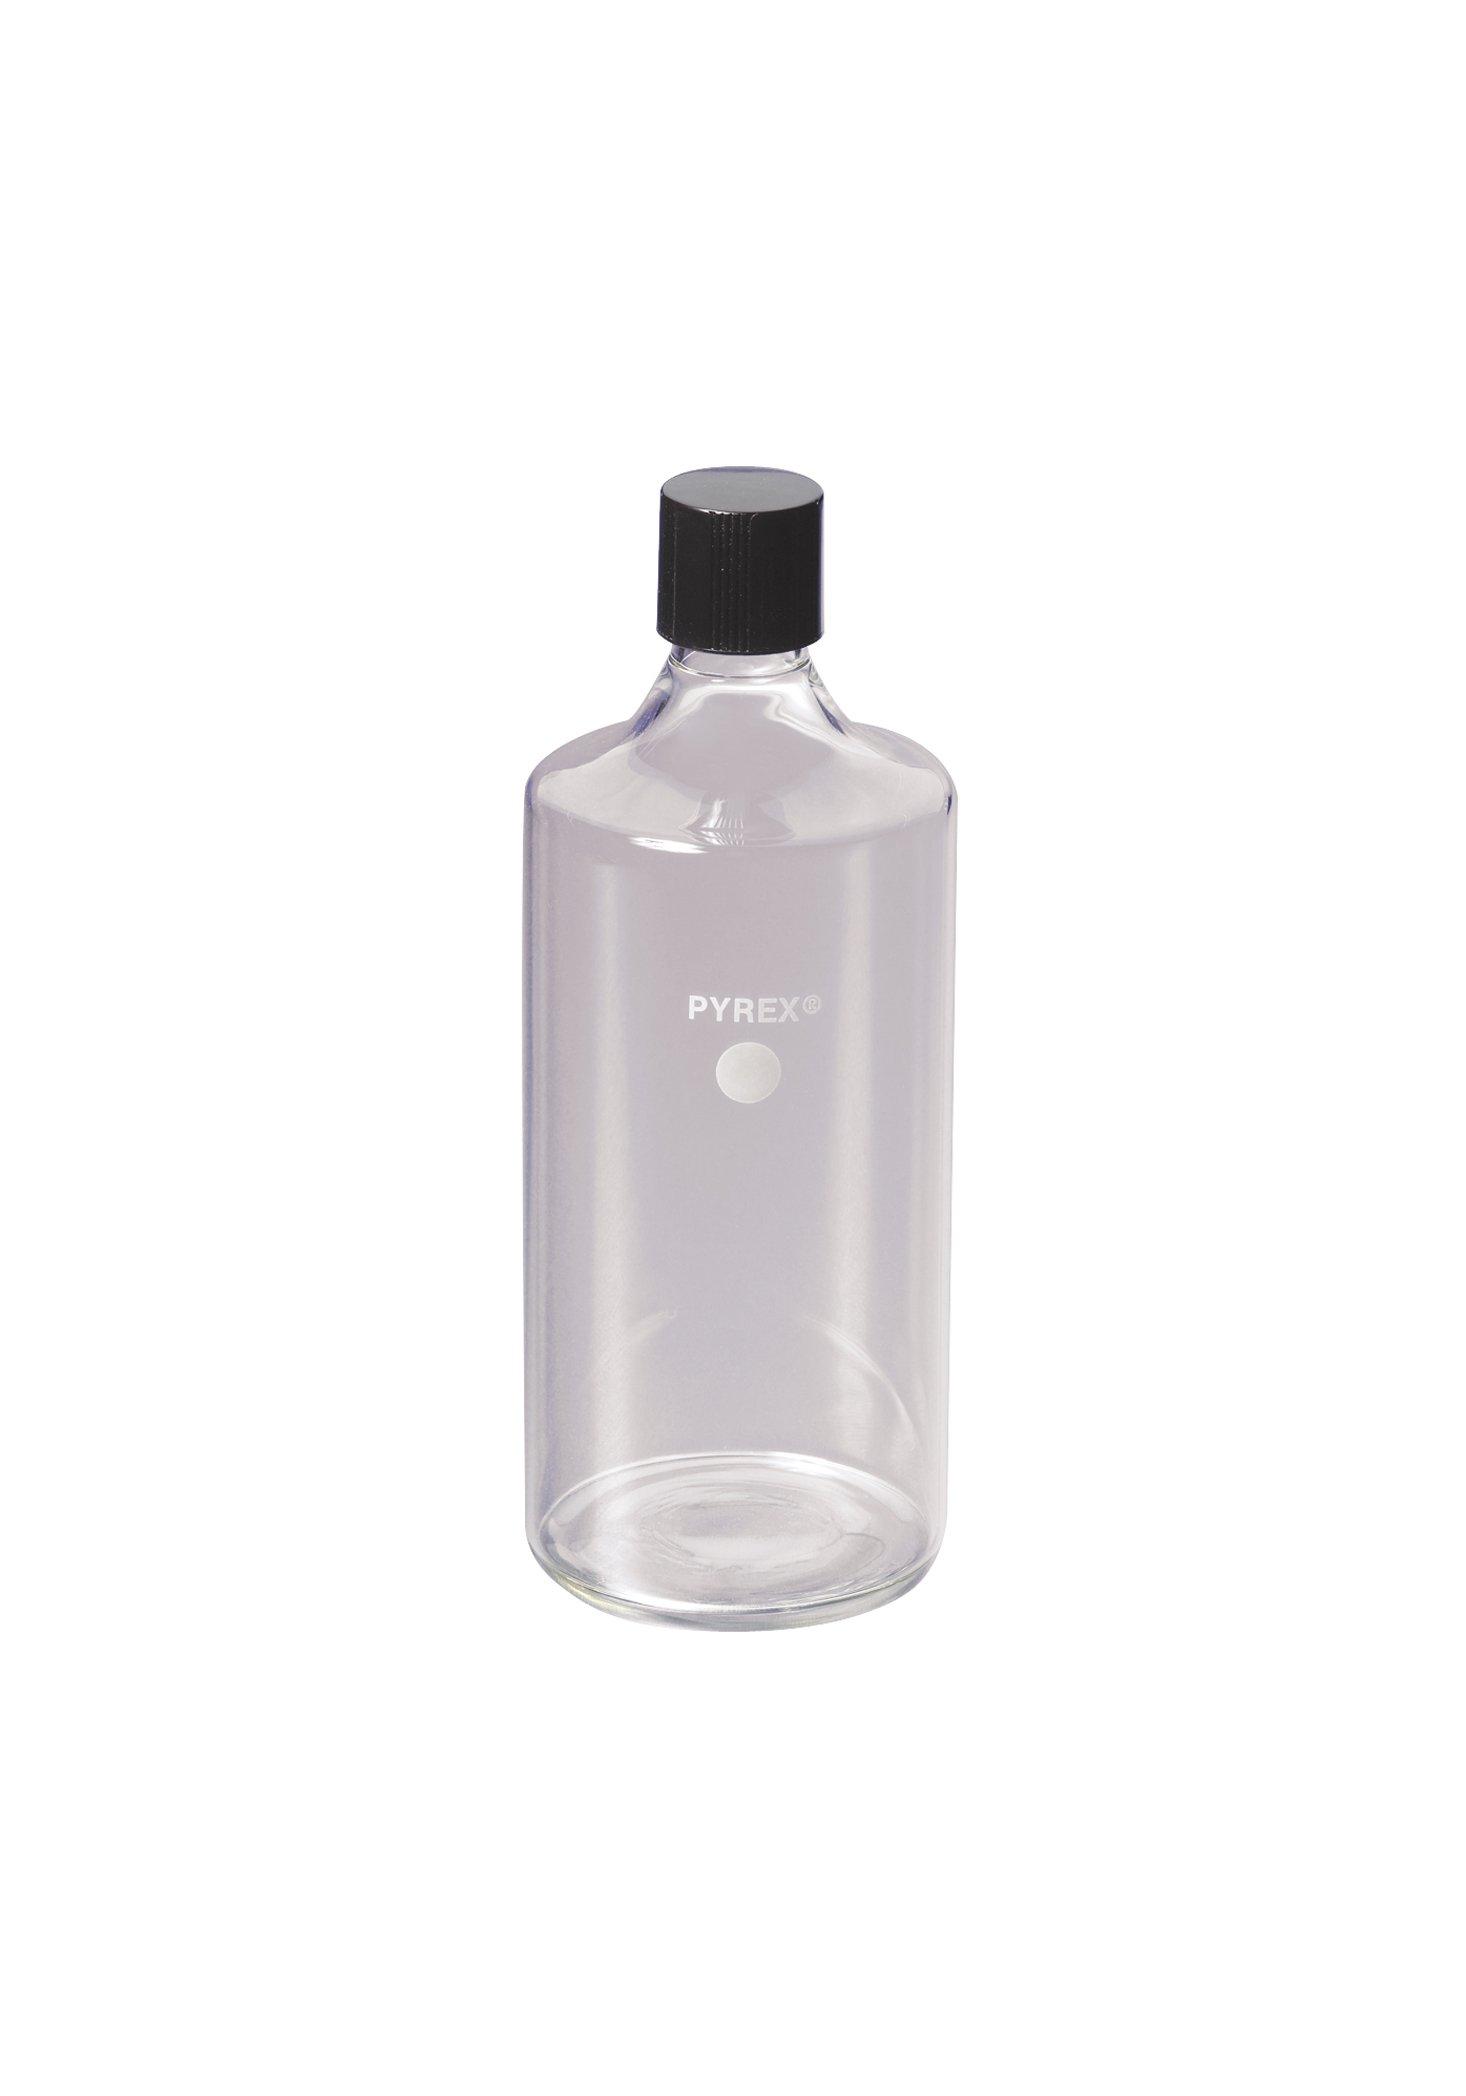 Corning Pyrex Borosilicate Glass Straight Neck Roller Bottles with 38mm Phenolic Screw Cap (Case of 2)